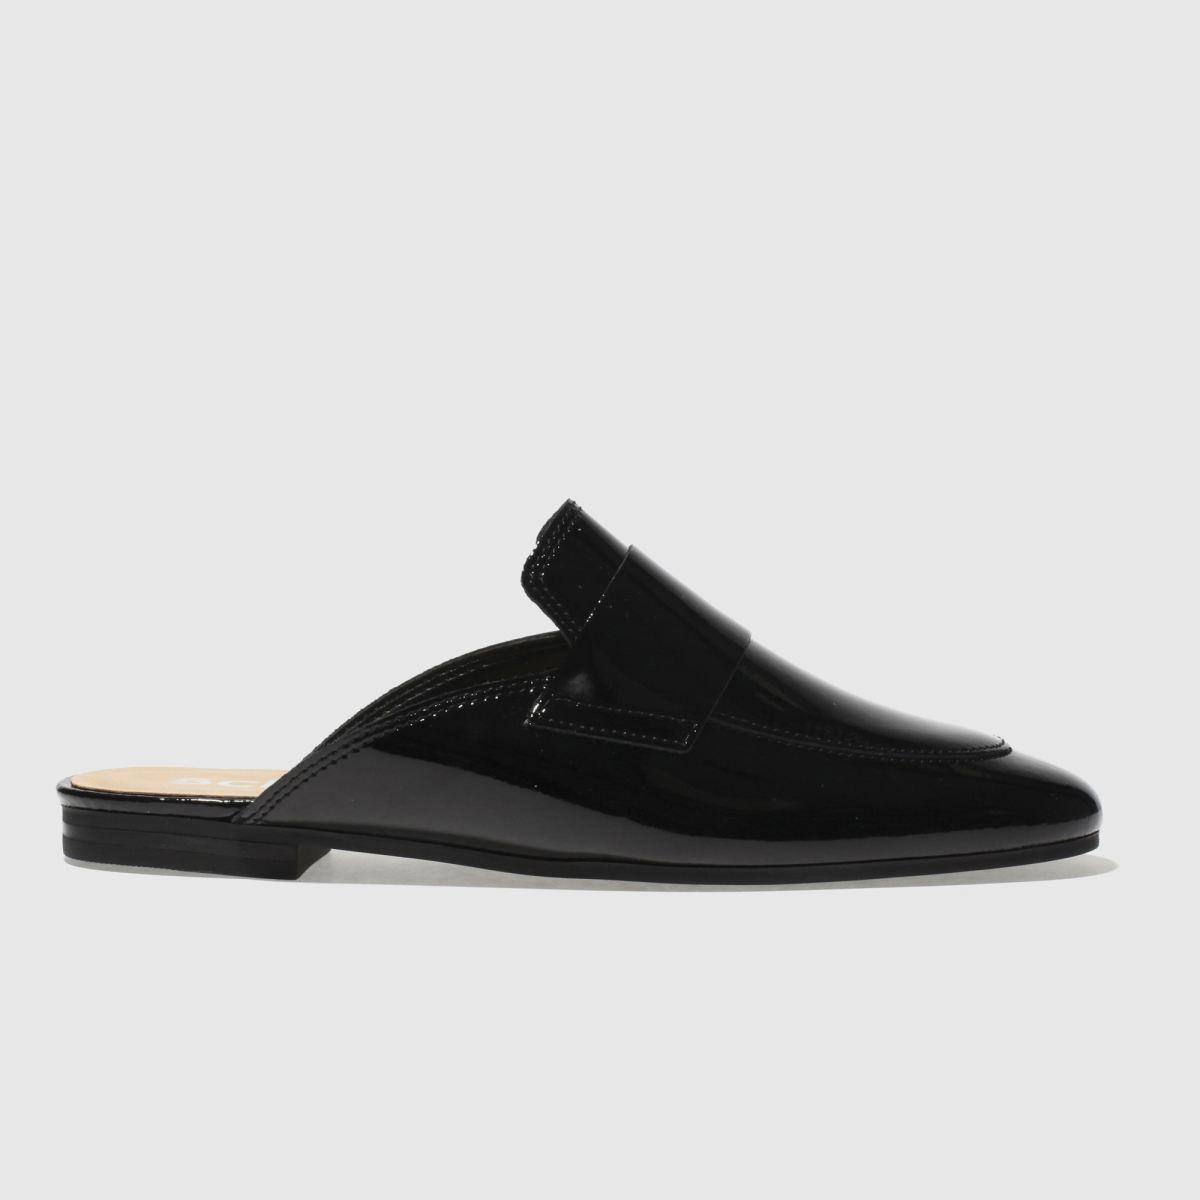 Schuh Black Fancy Flat Shoes